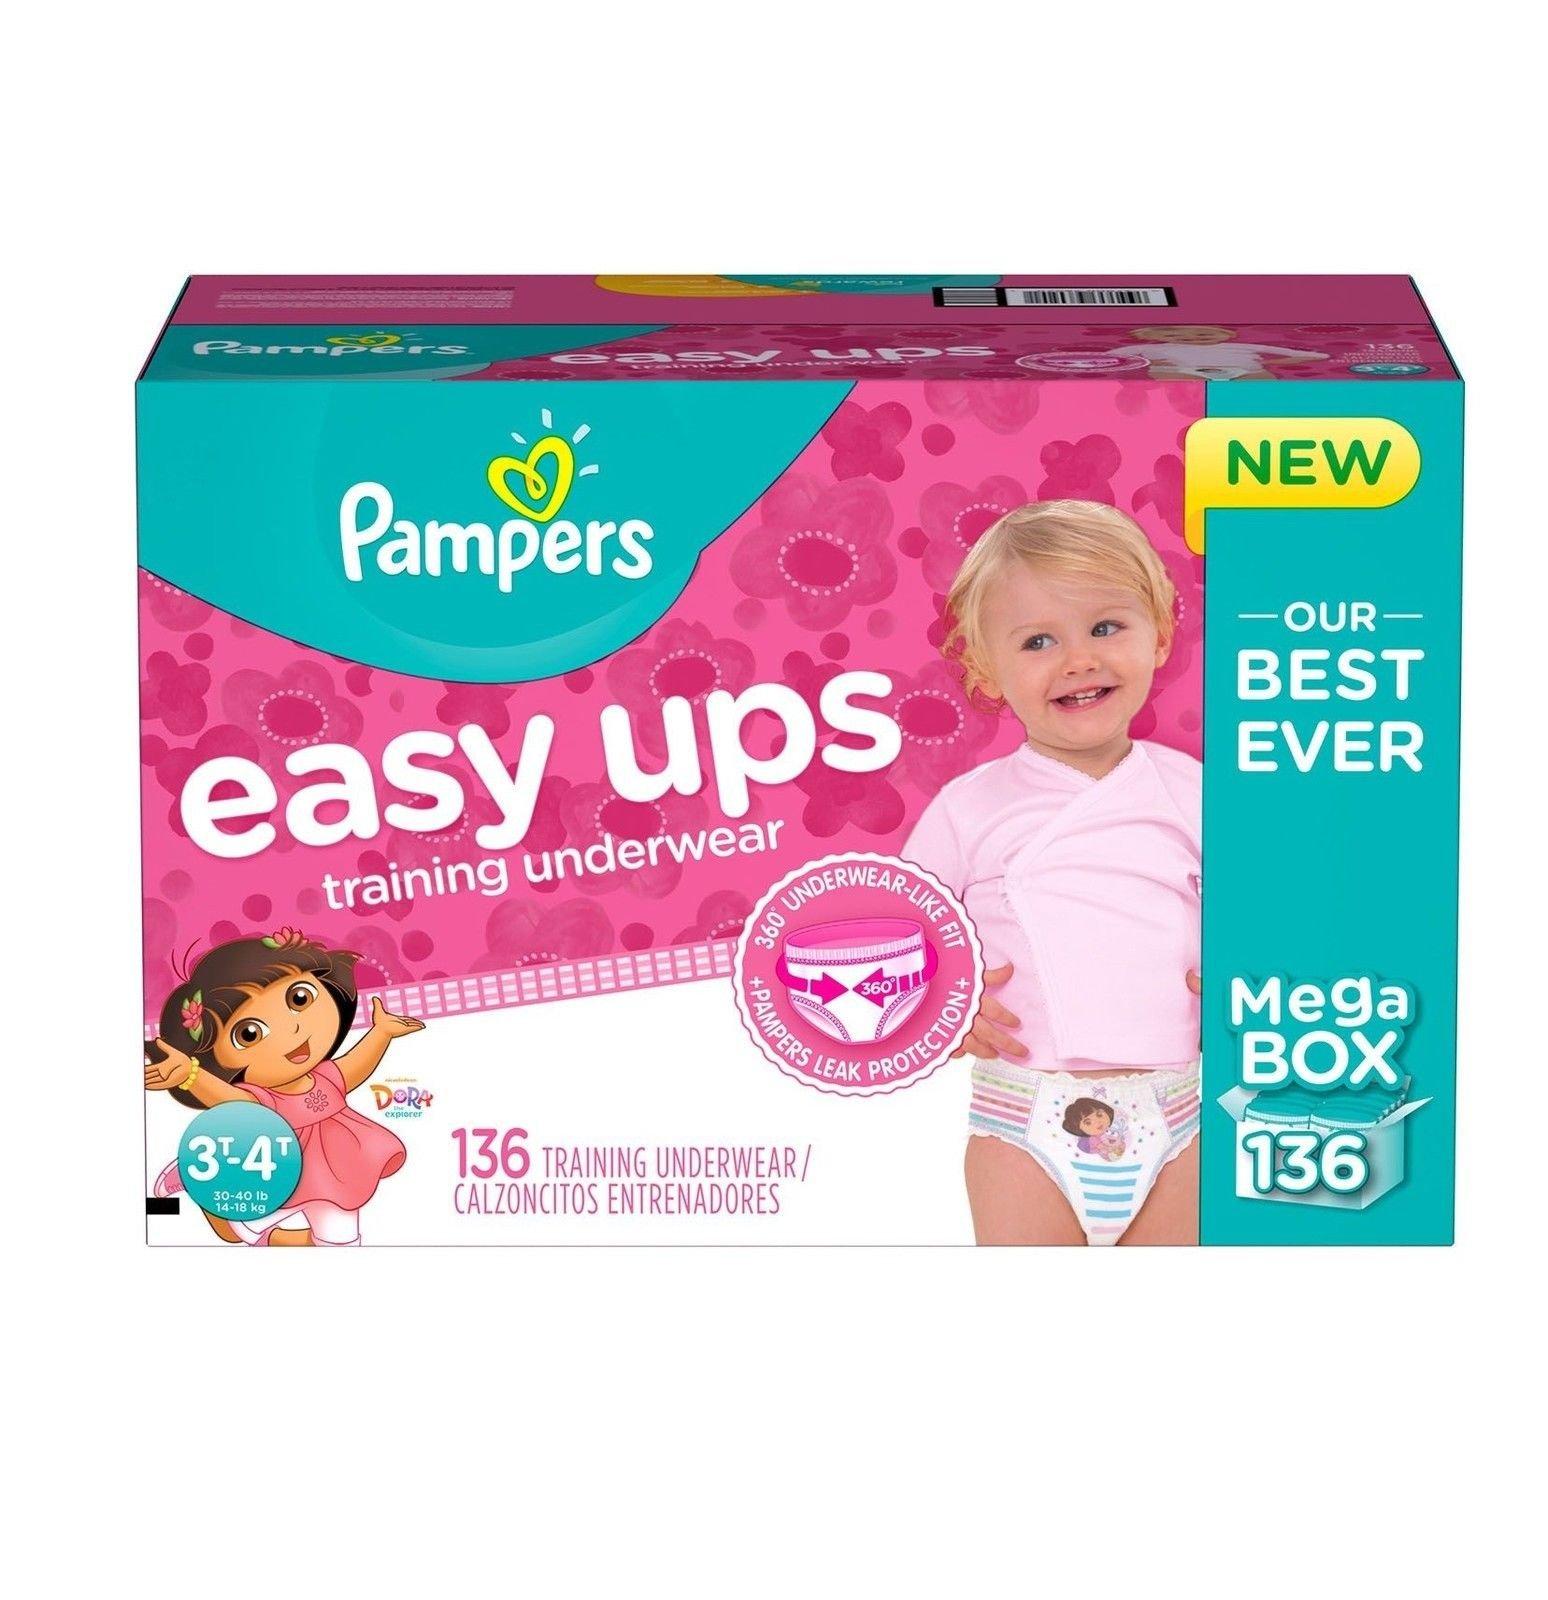 Pampers Easy Ups Training Underwear for Girls, Dora the Explorer (3T-4T, 136-Pack)